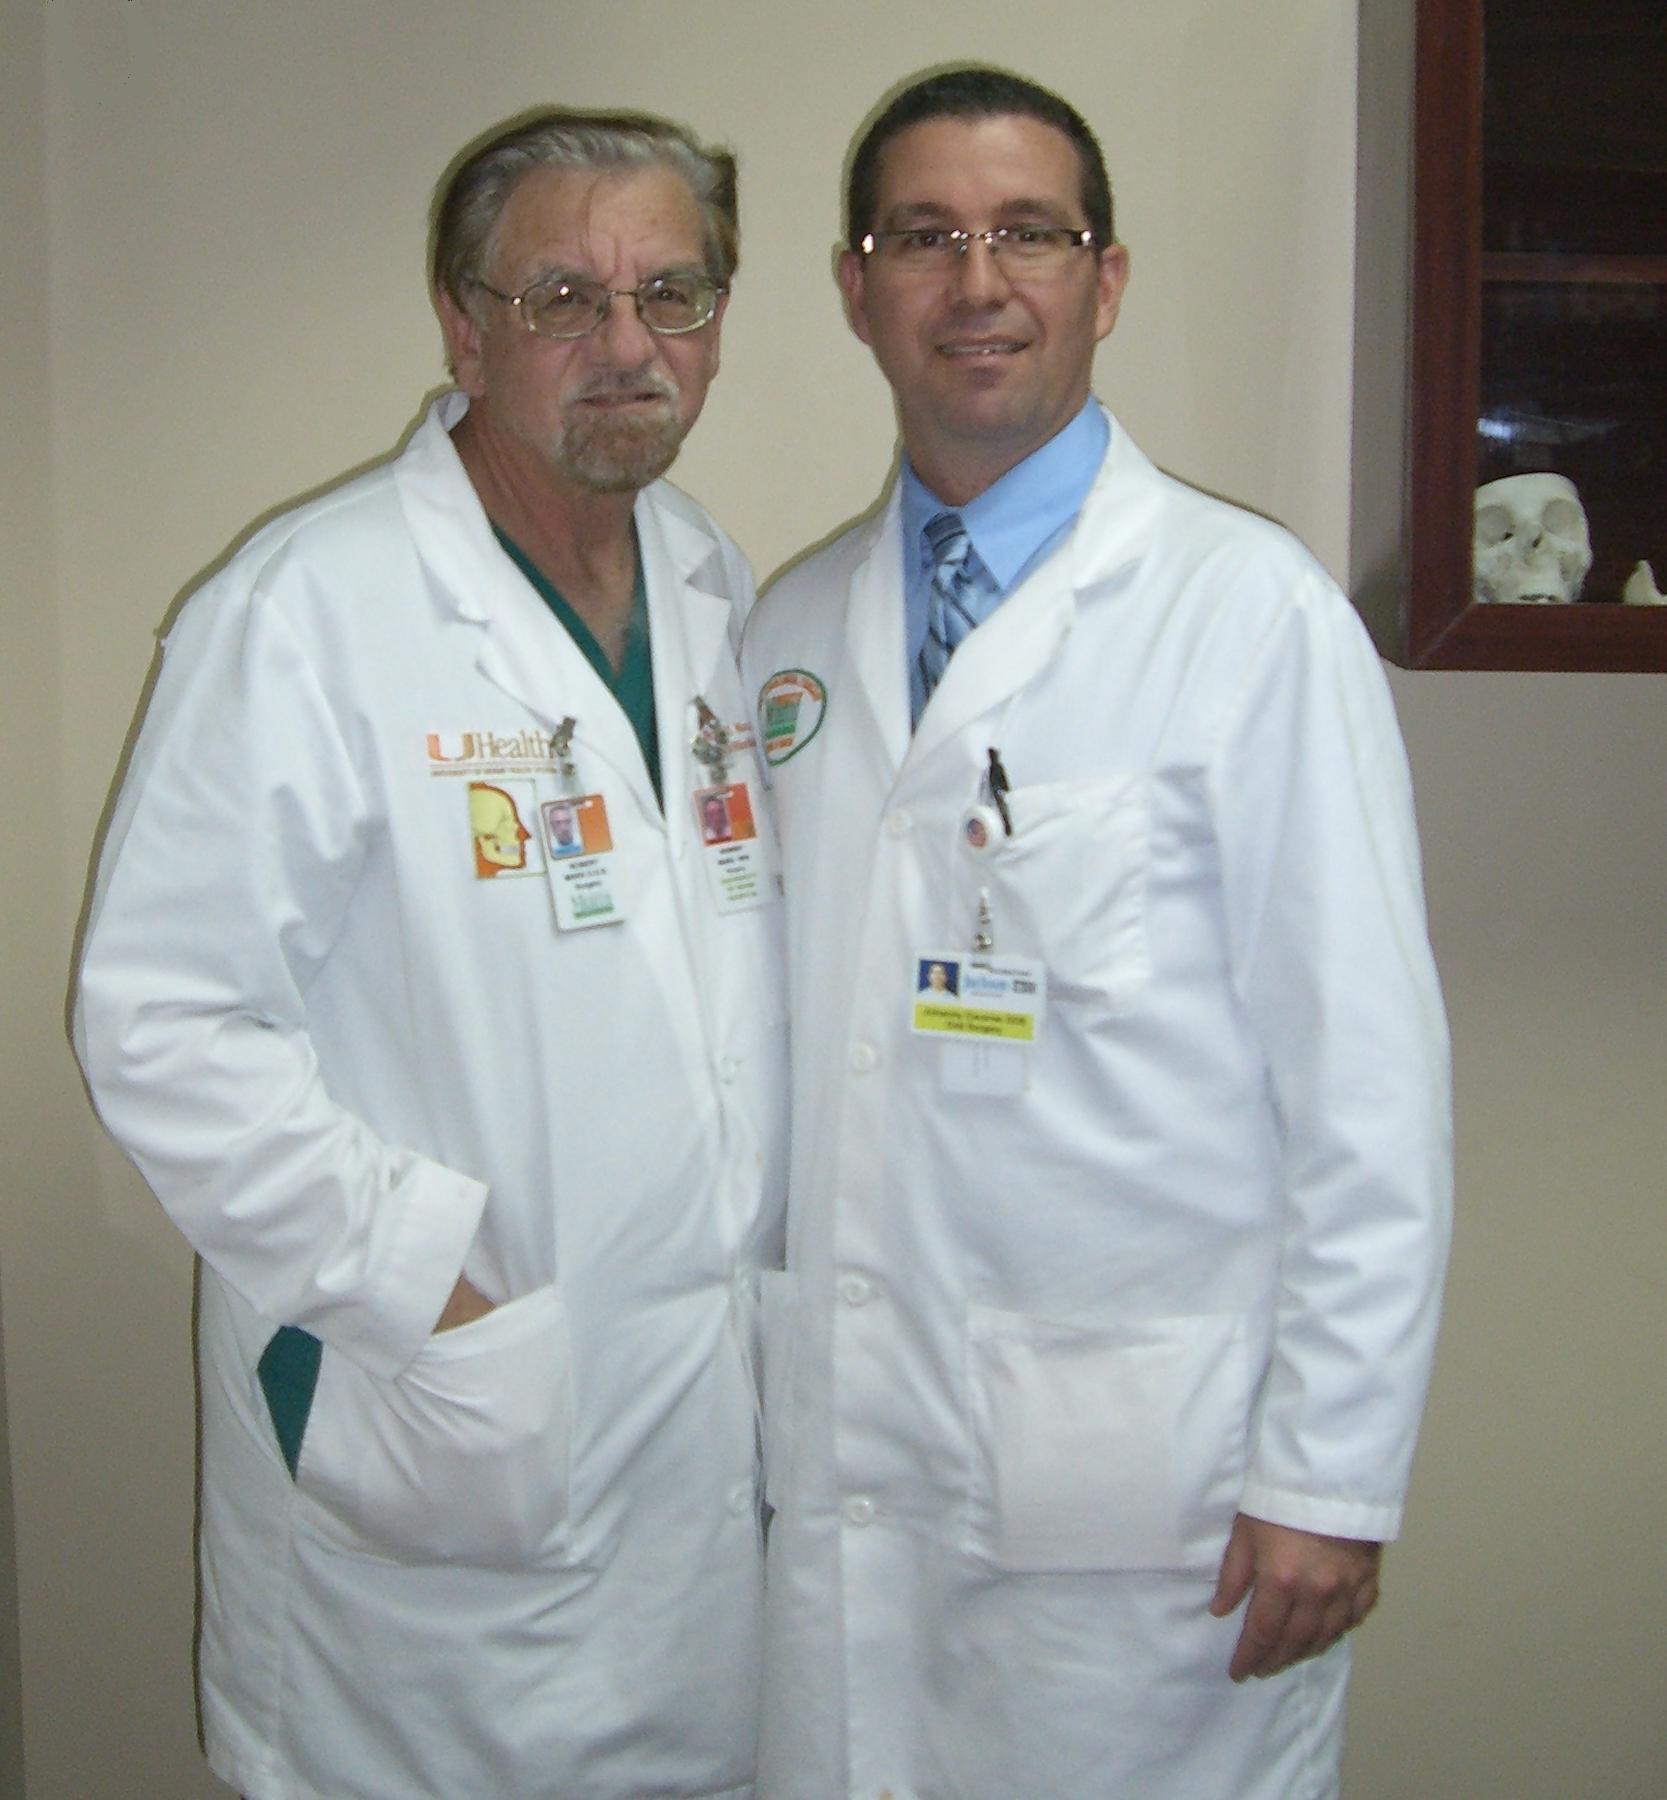 Dr. Johanny Caceres with Professor Robert Marx at Jackson Memorial Hospital.